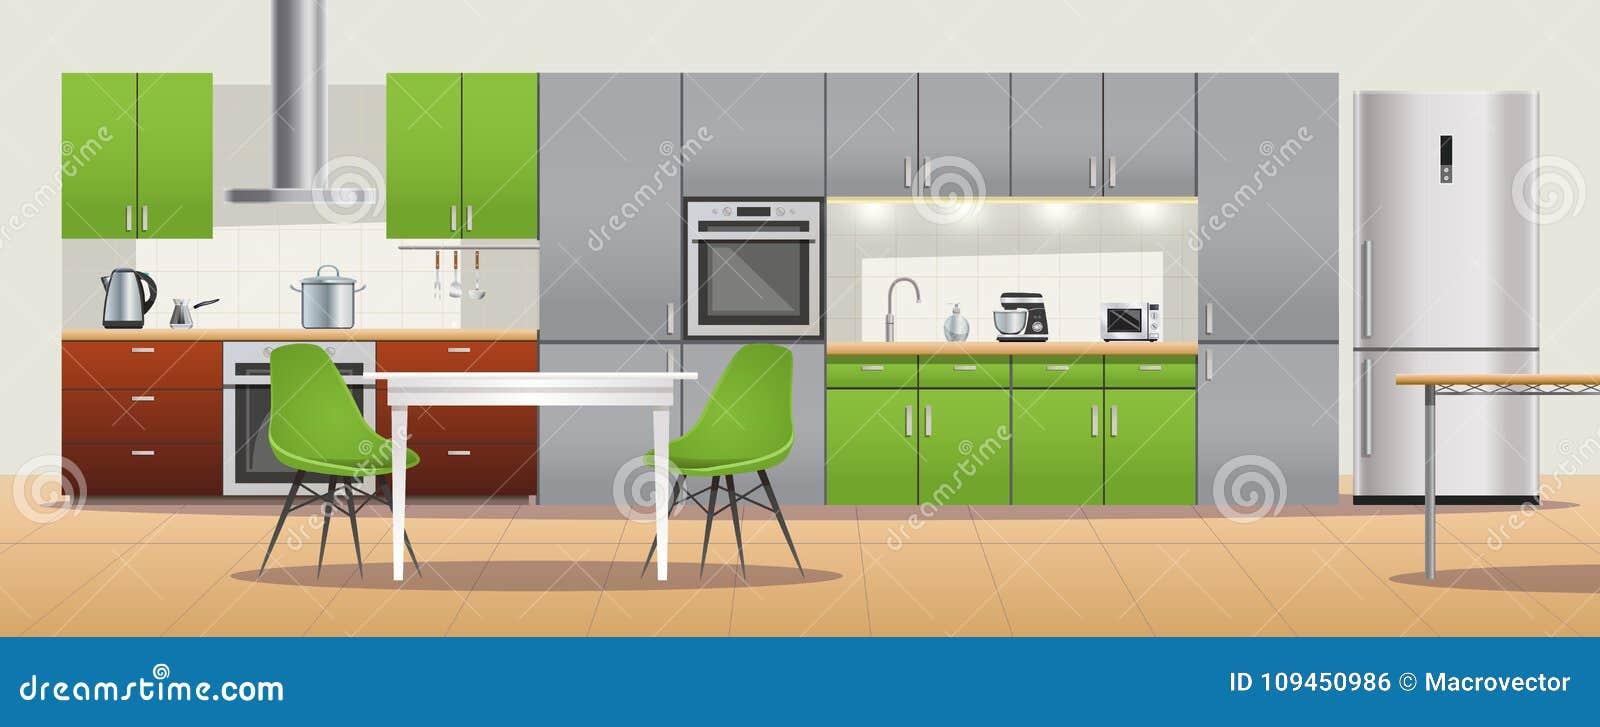 Modern Kitchen Interior Design Poster Stock Vector ...